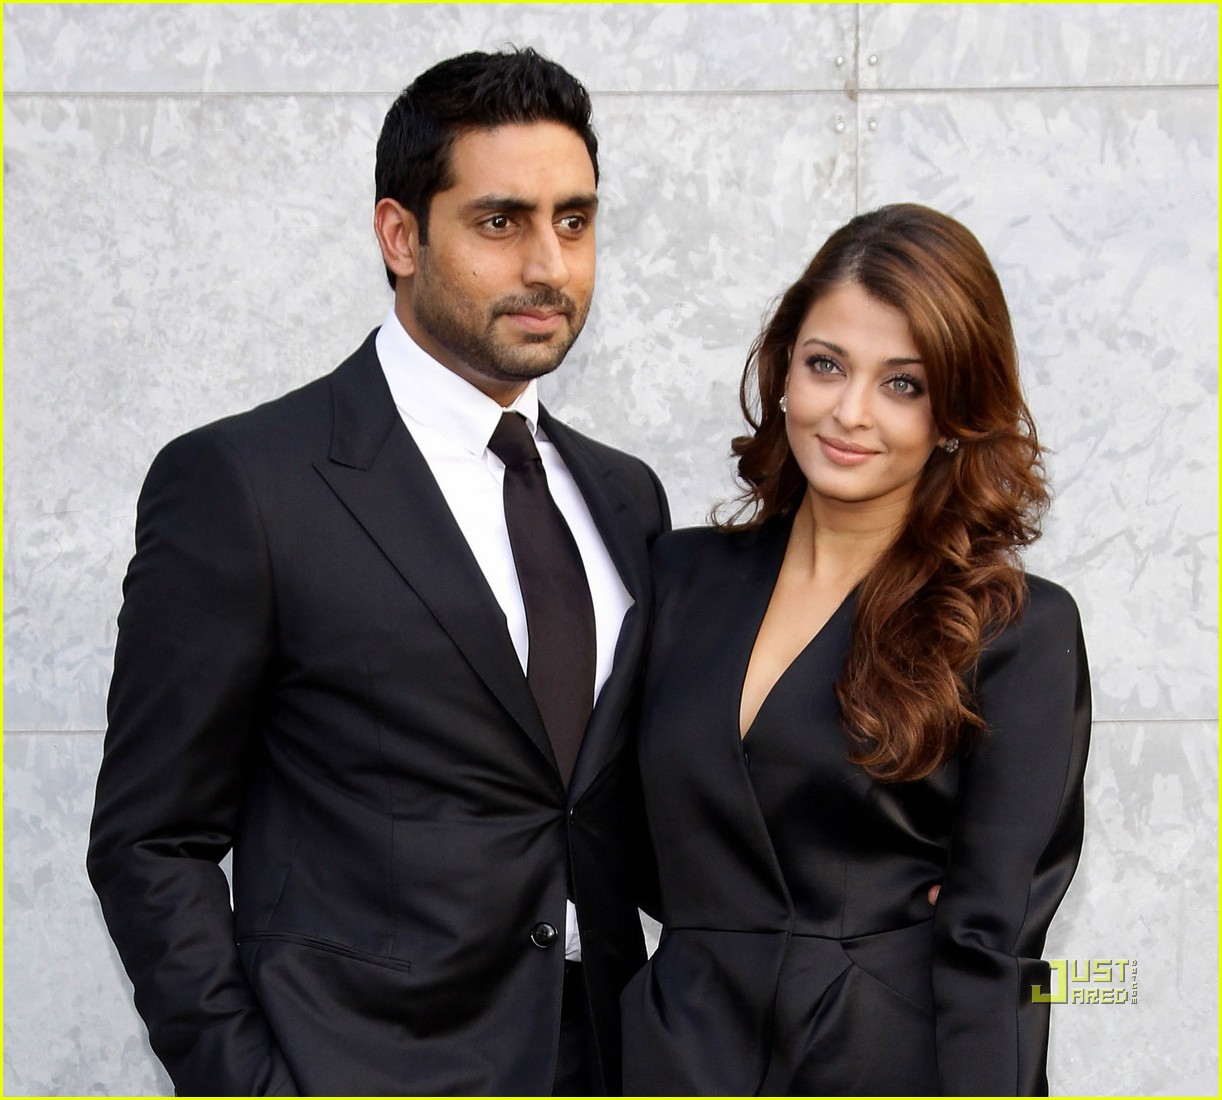 Aishwarya Rai Bachchan with mysterious, Husband Abhishek Bachchan